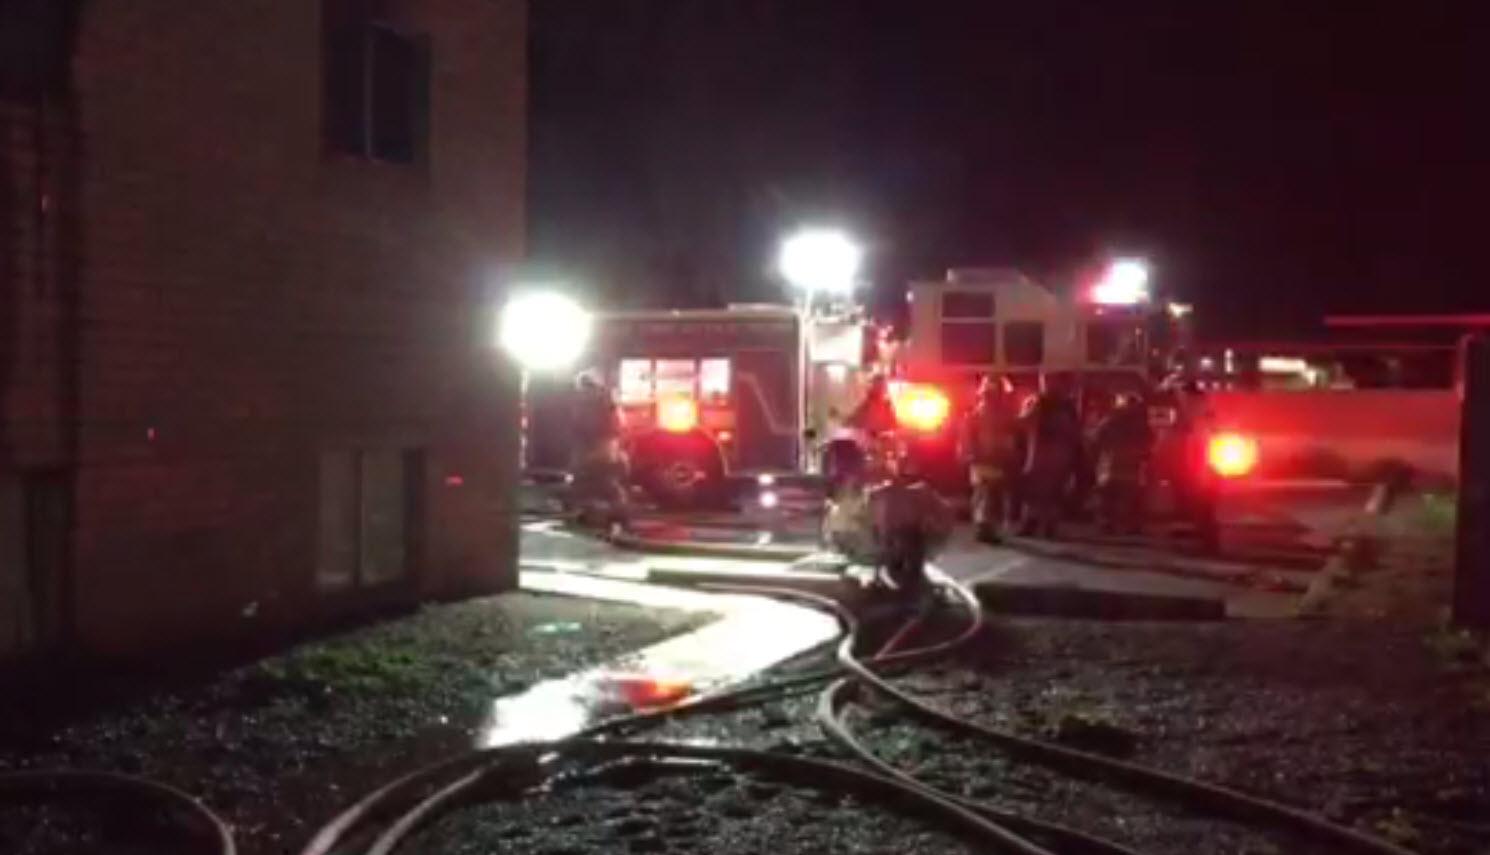 SOURCE: Phoenix Fire